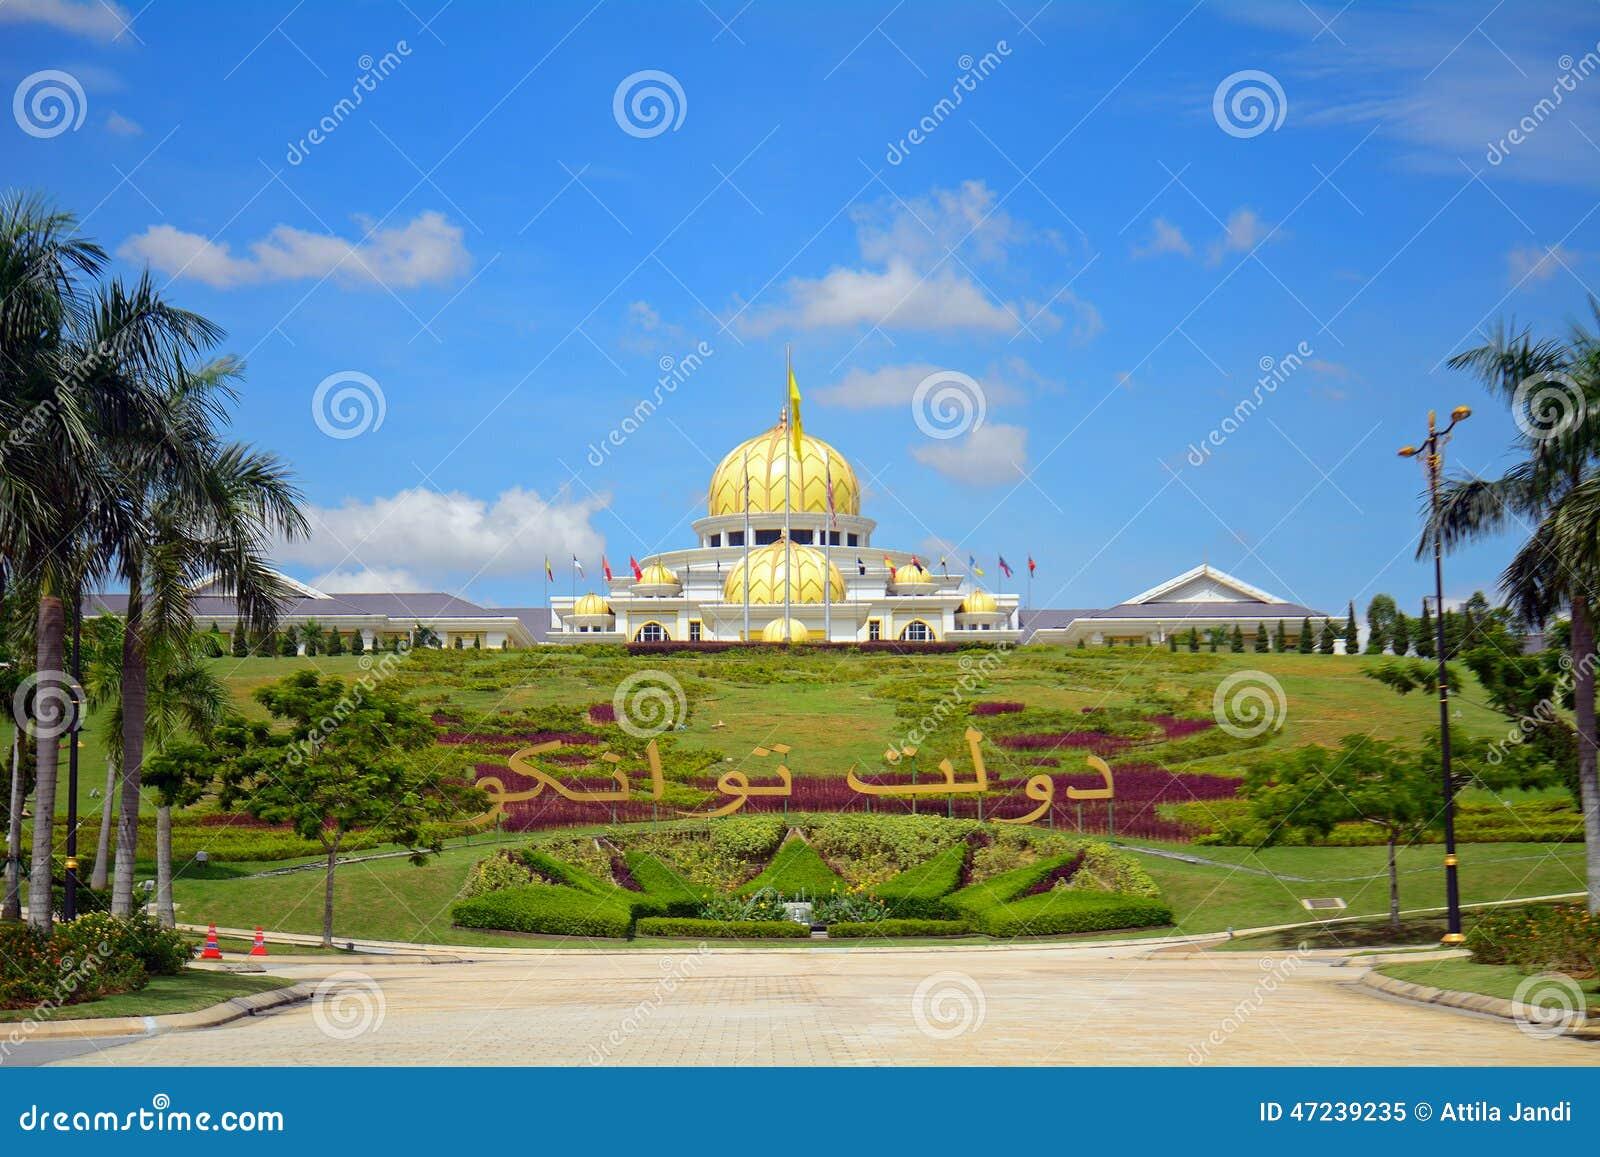 El palacio del sultán, Kuala Lumpur, Malasia